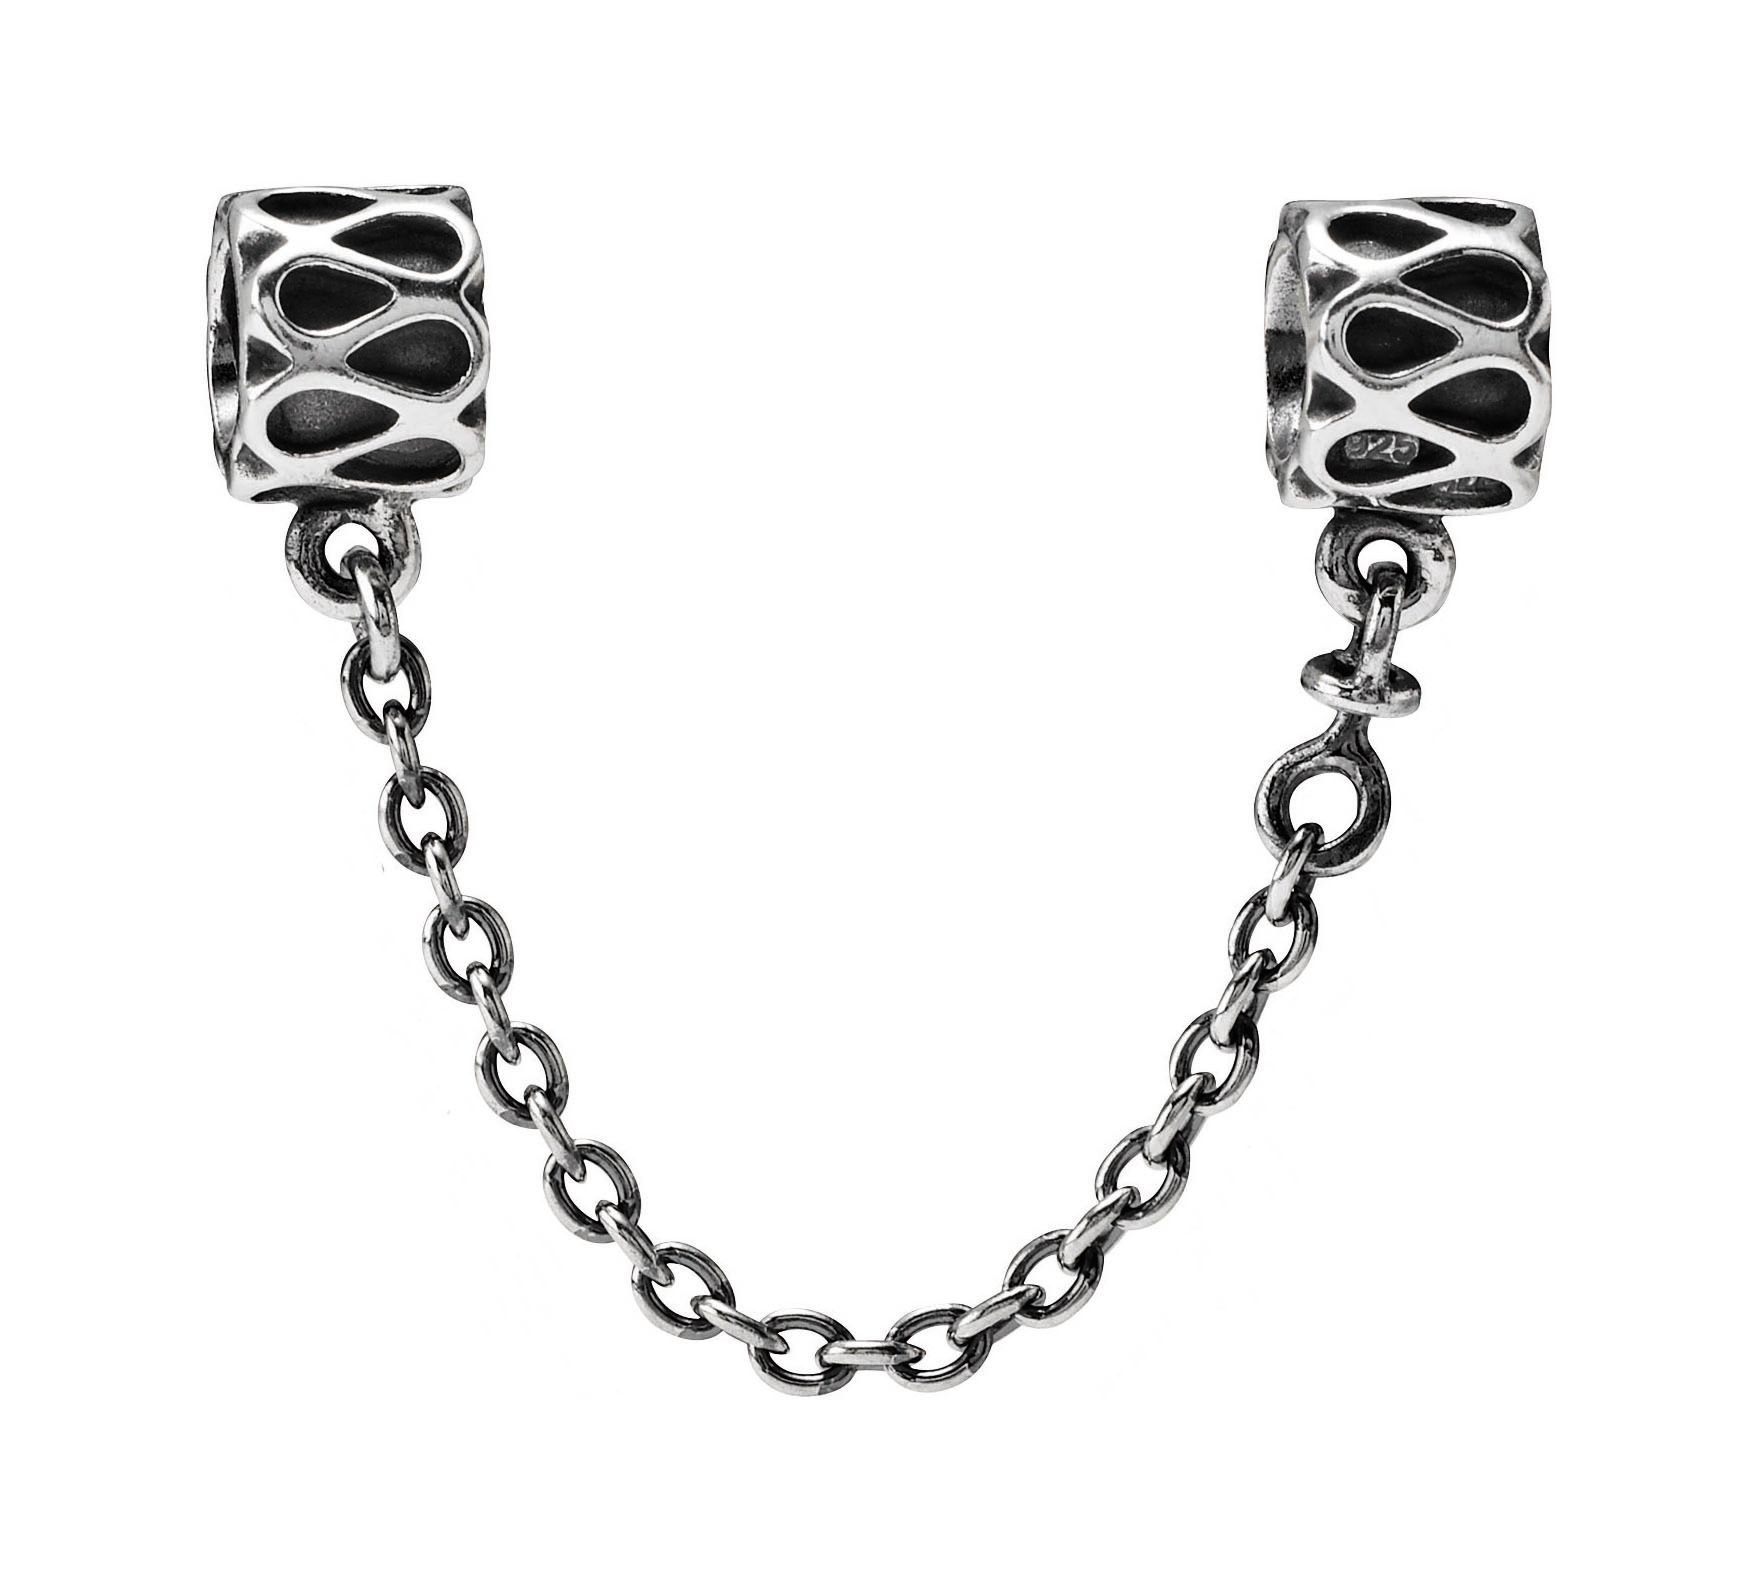 Pandora Safety Chain Raindrop 5cm 79031505 Pandora